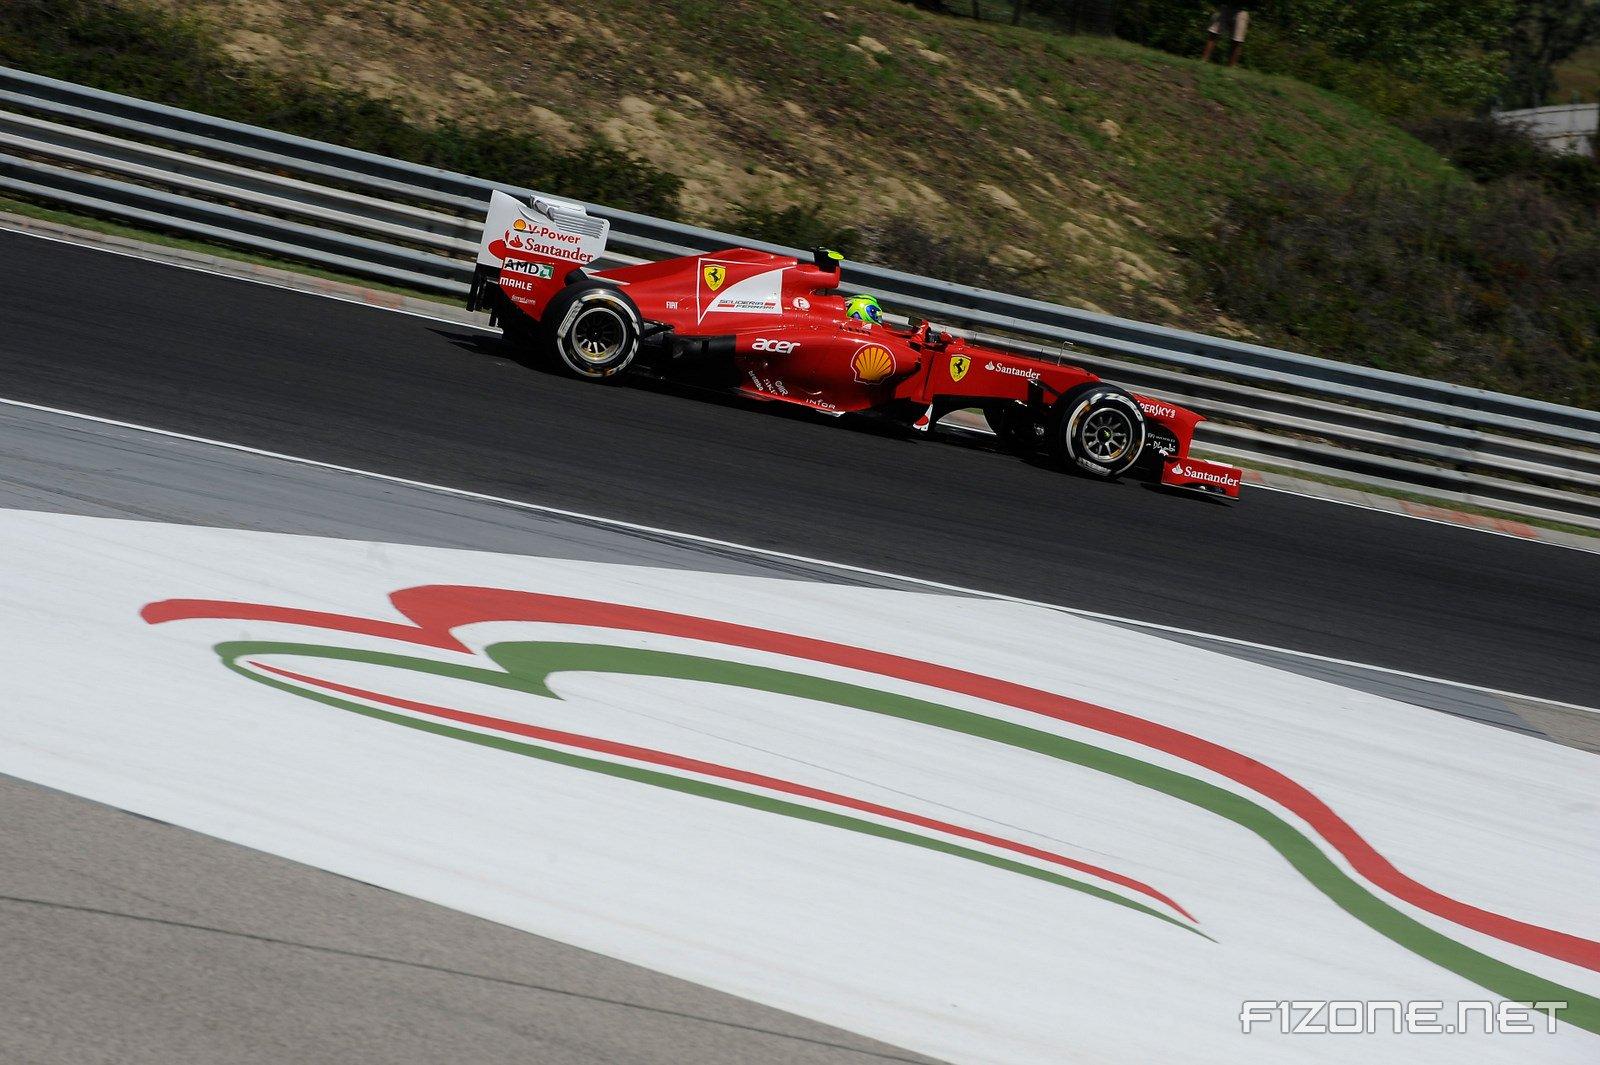 Briatore: Ferrari should keep Massa for 2013